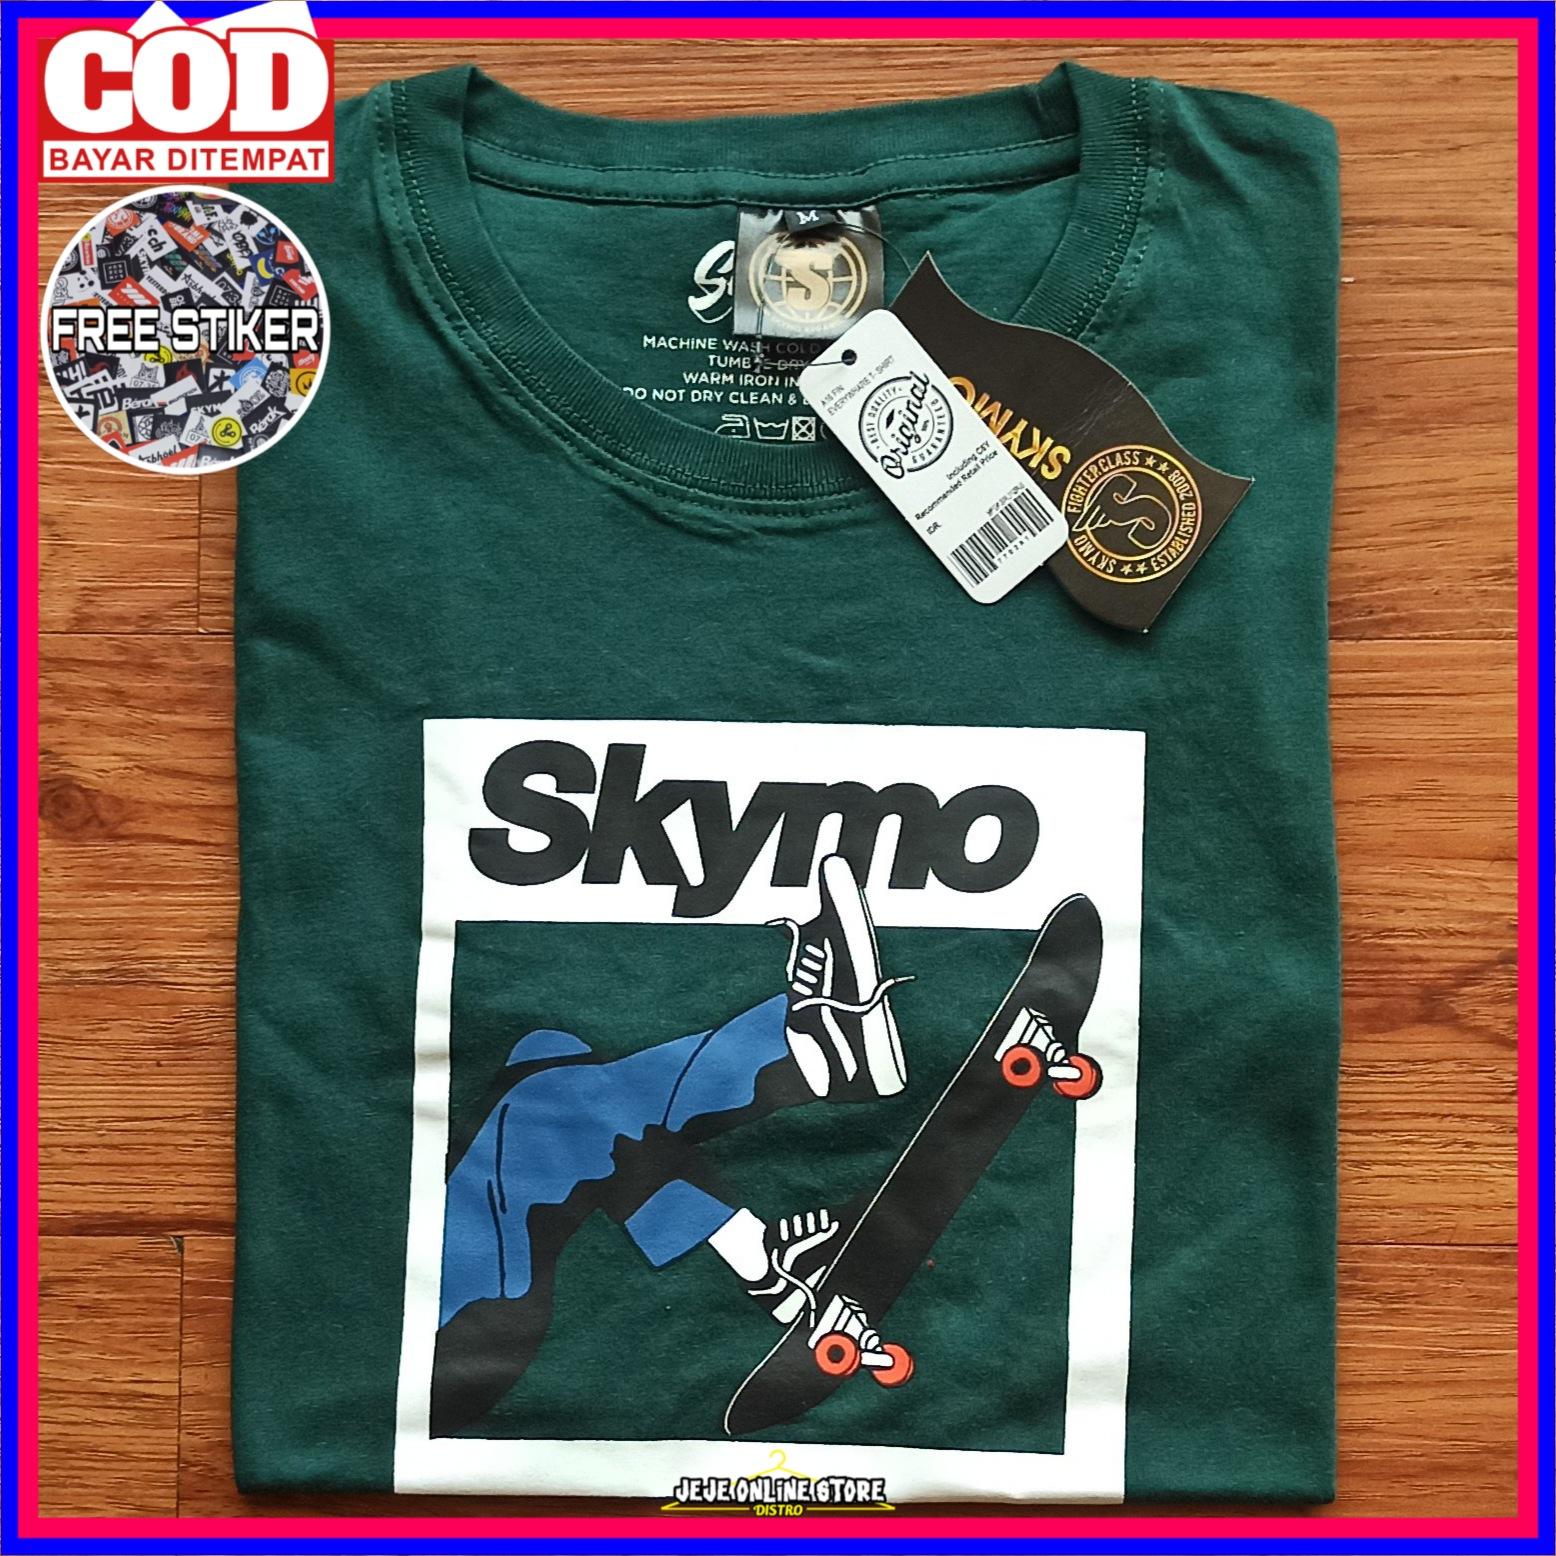 ss skymo apparel a102 free stiker